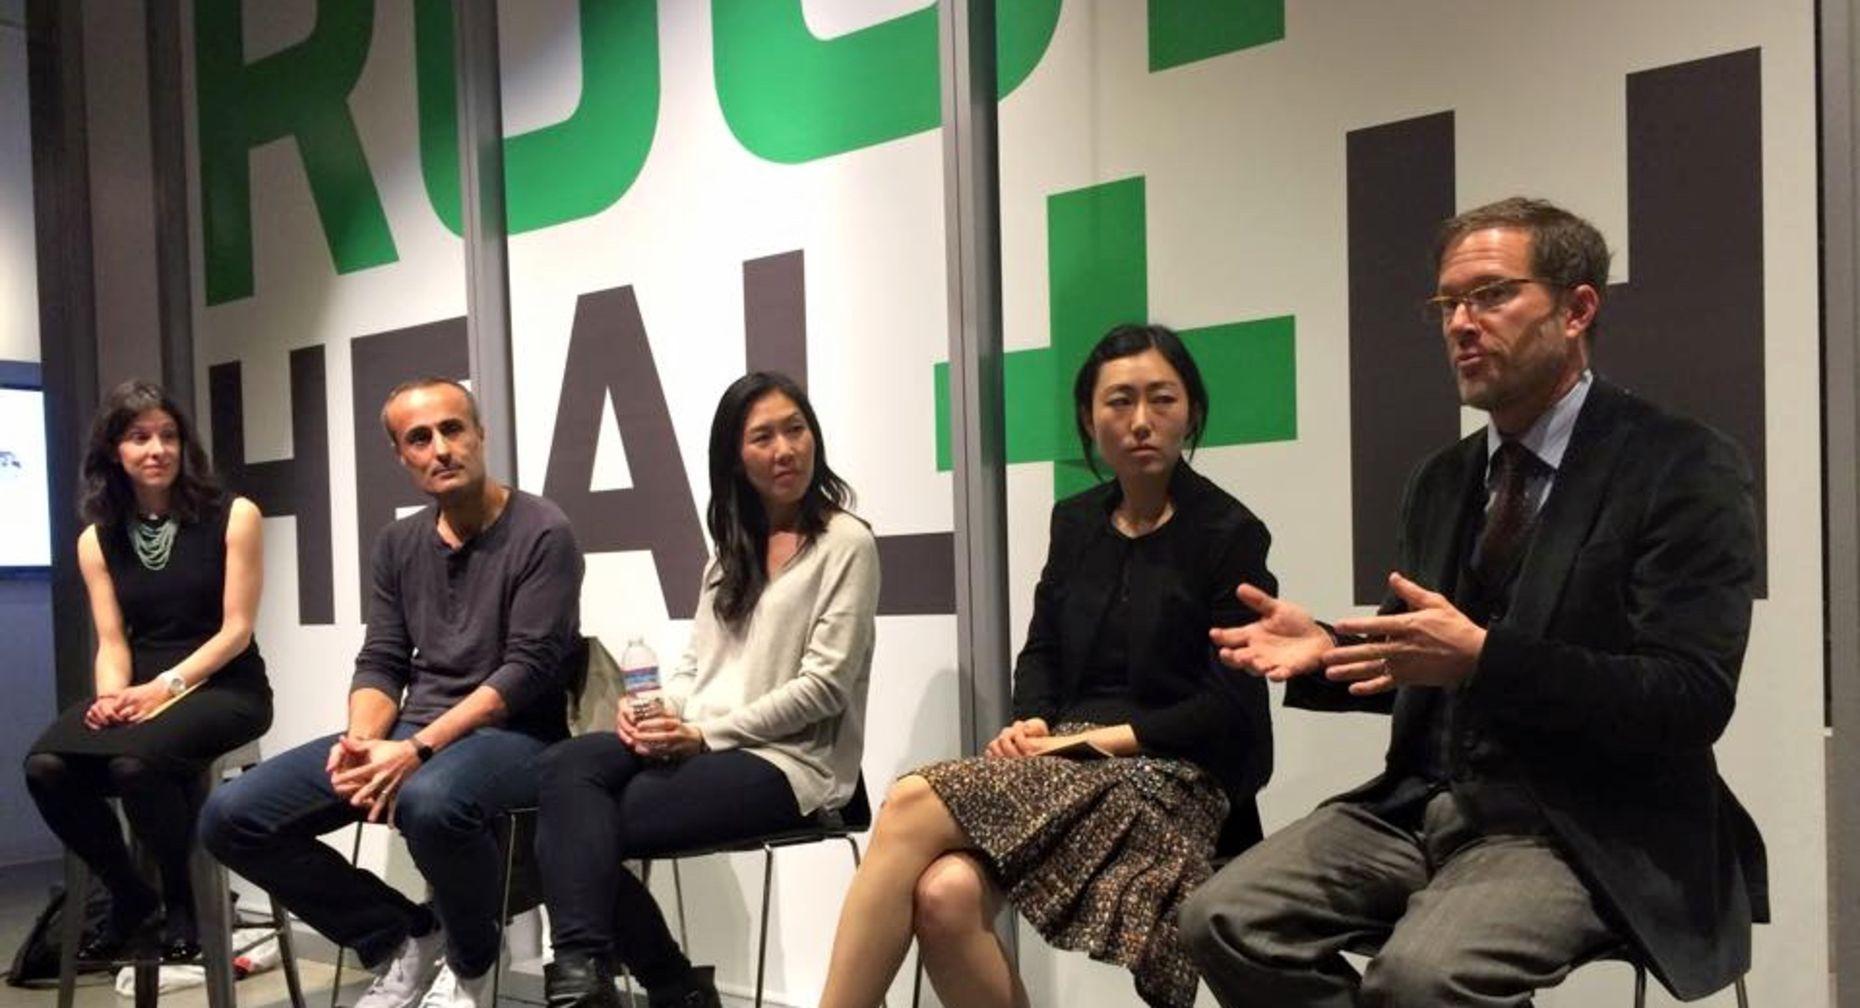 Jessica Lessin, Ali Diab, Jennifer Tye, Jini Kim, Jordan Shlain. Photo by Stephen Nellis.